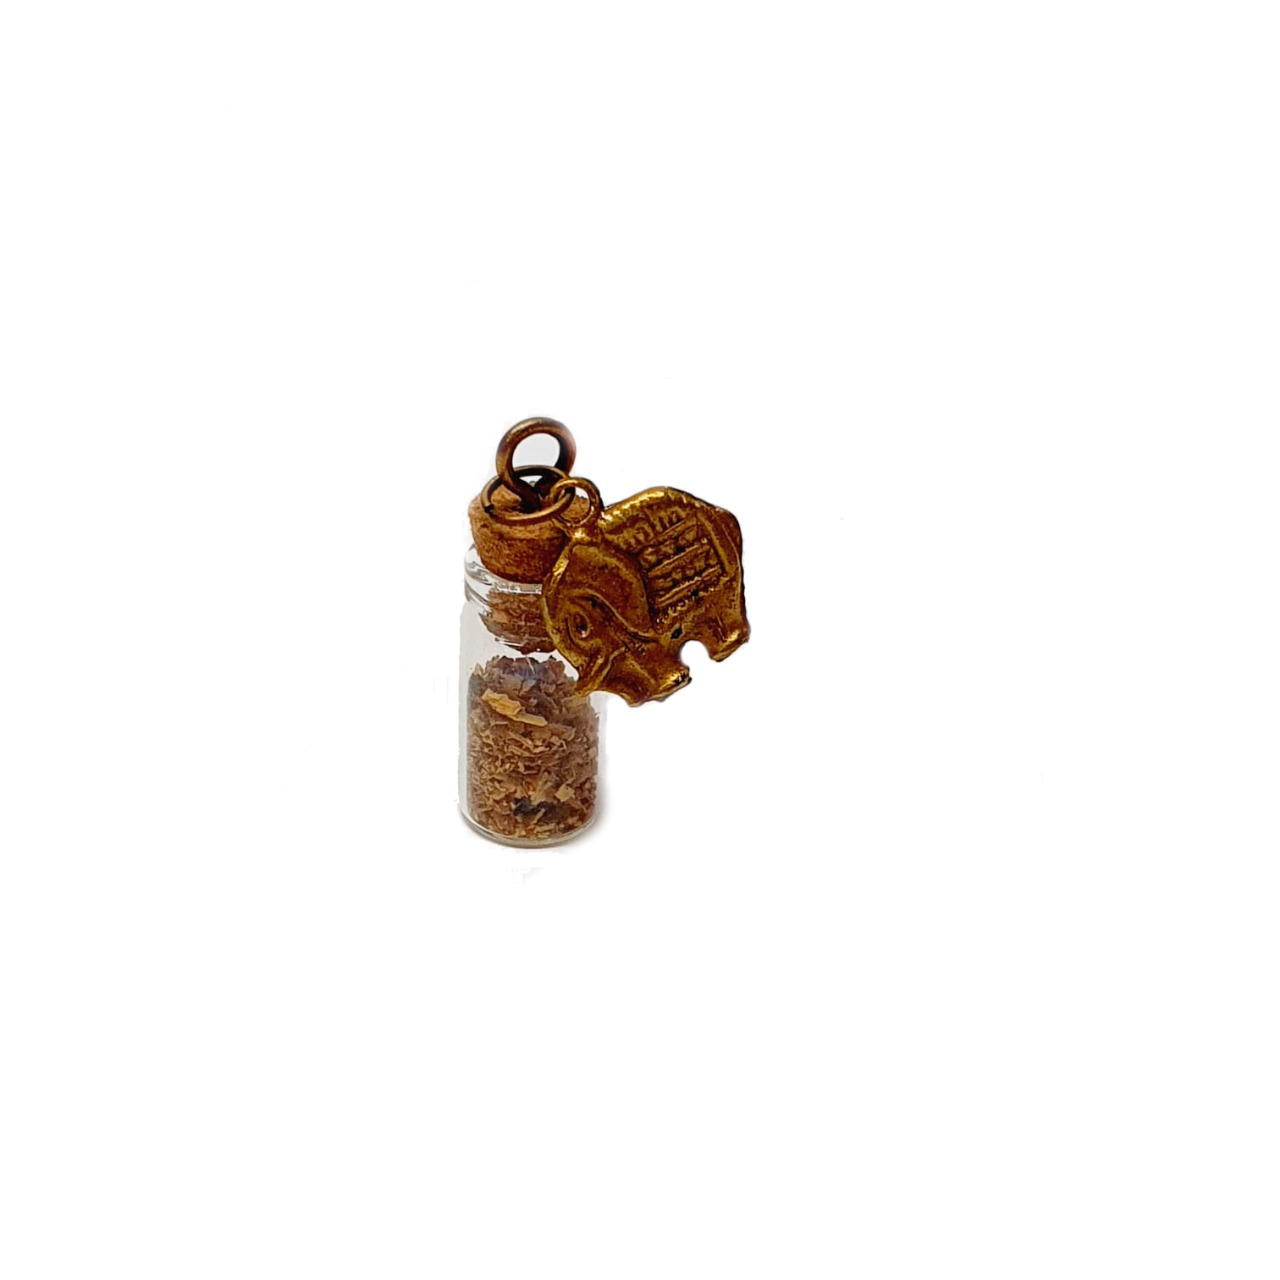 Amuleto de Pedra Natural Palo Santo